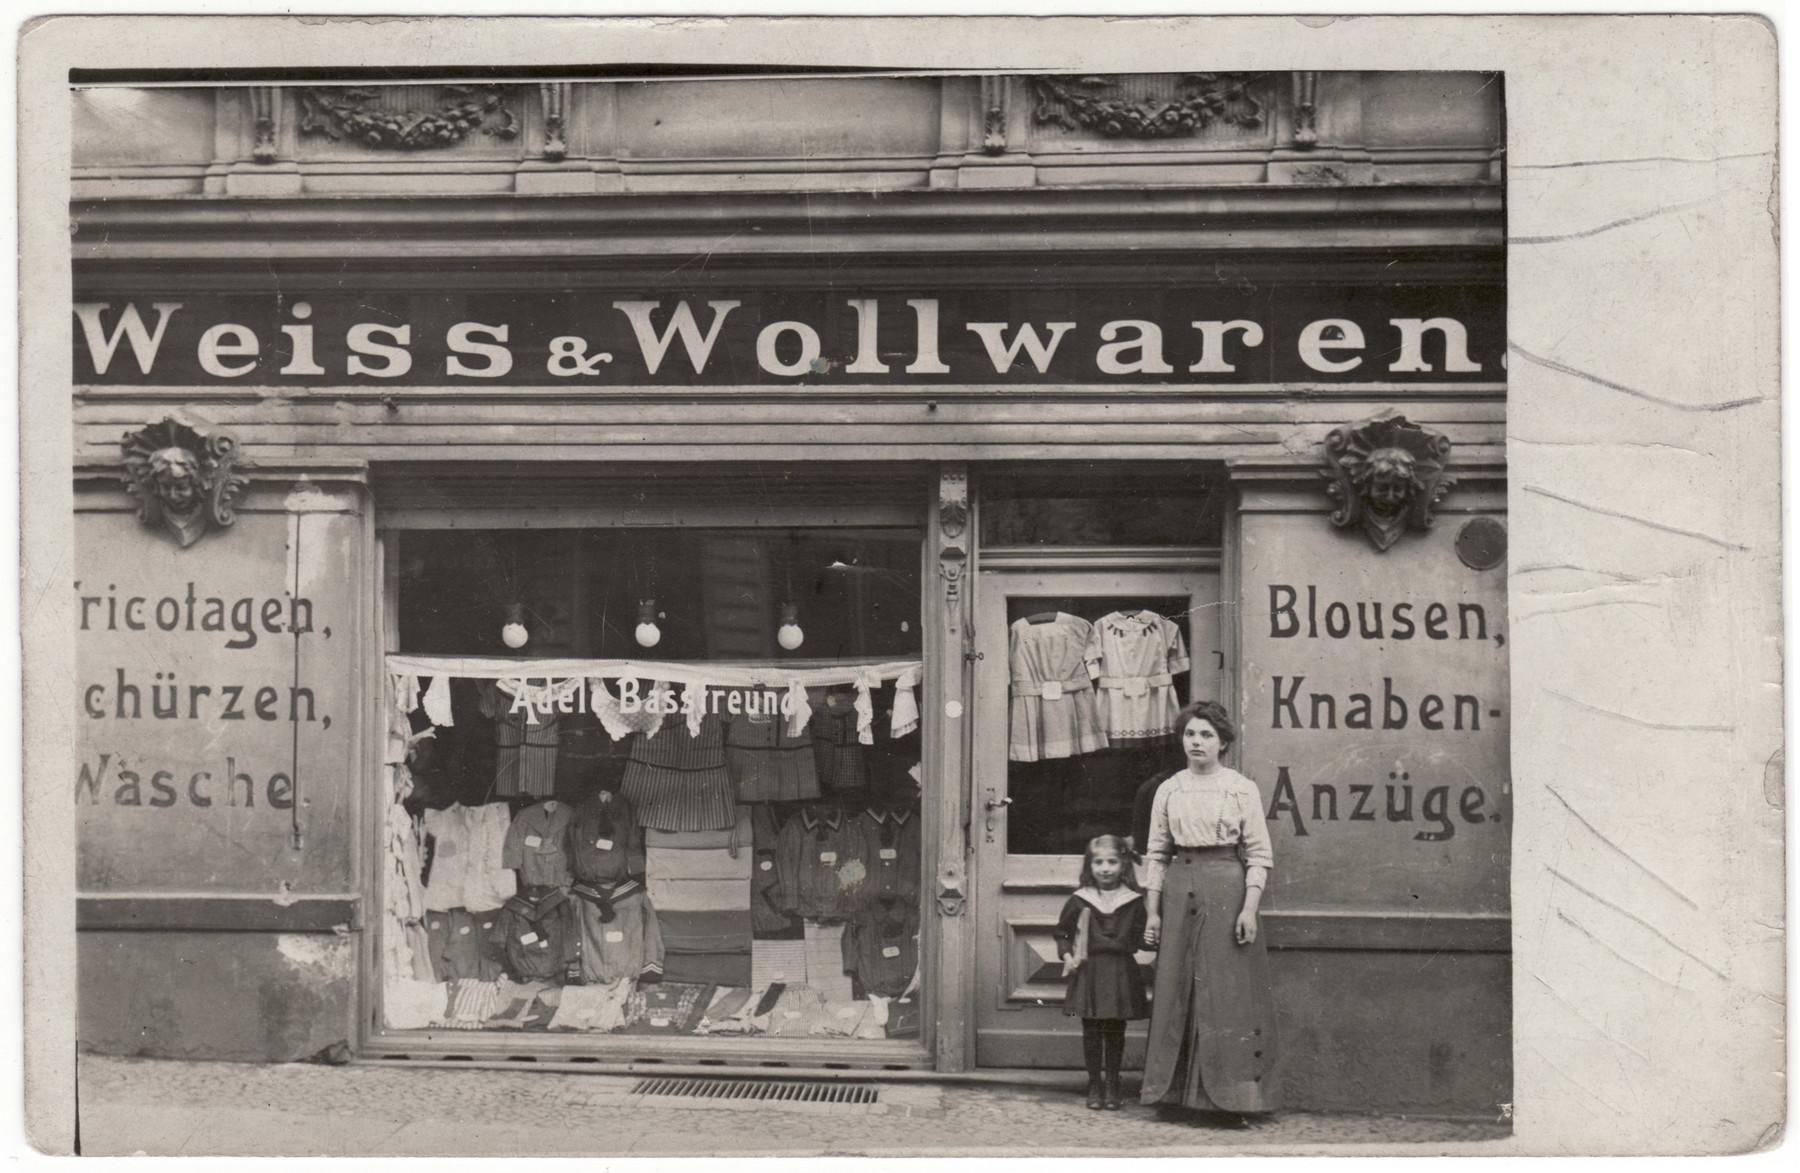 Adele Bassfreund stands outside her store on Georgenkirch Strasse 60, Berlin.